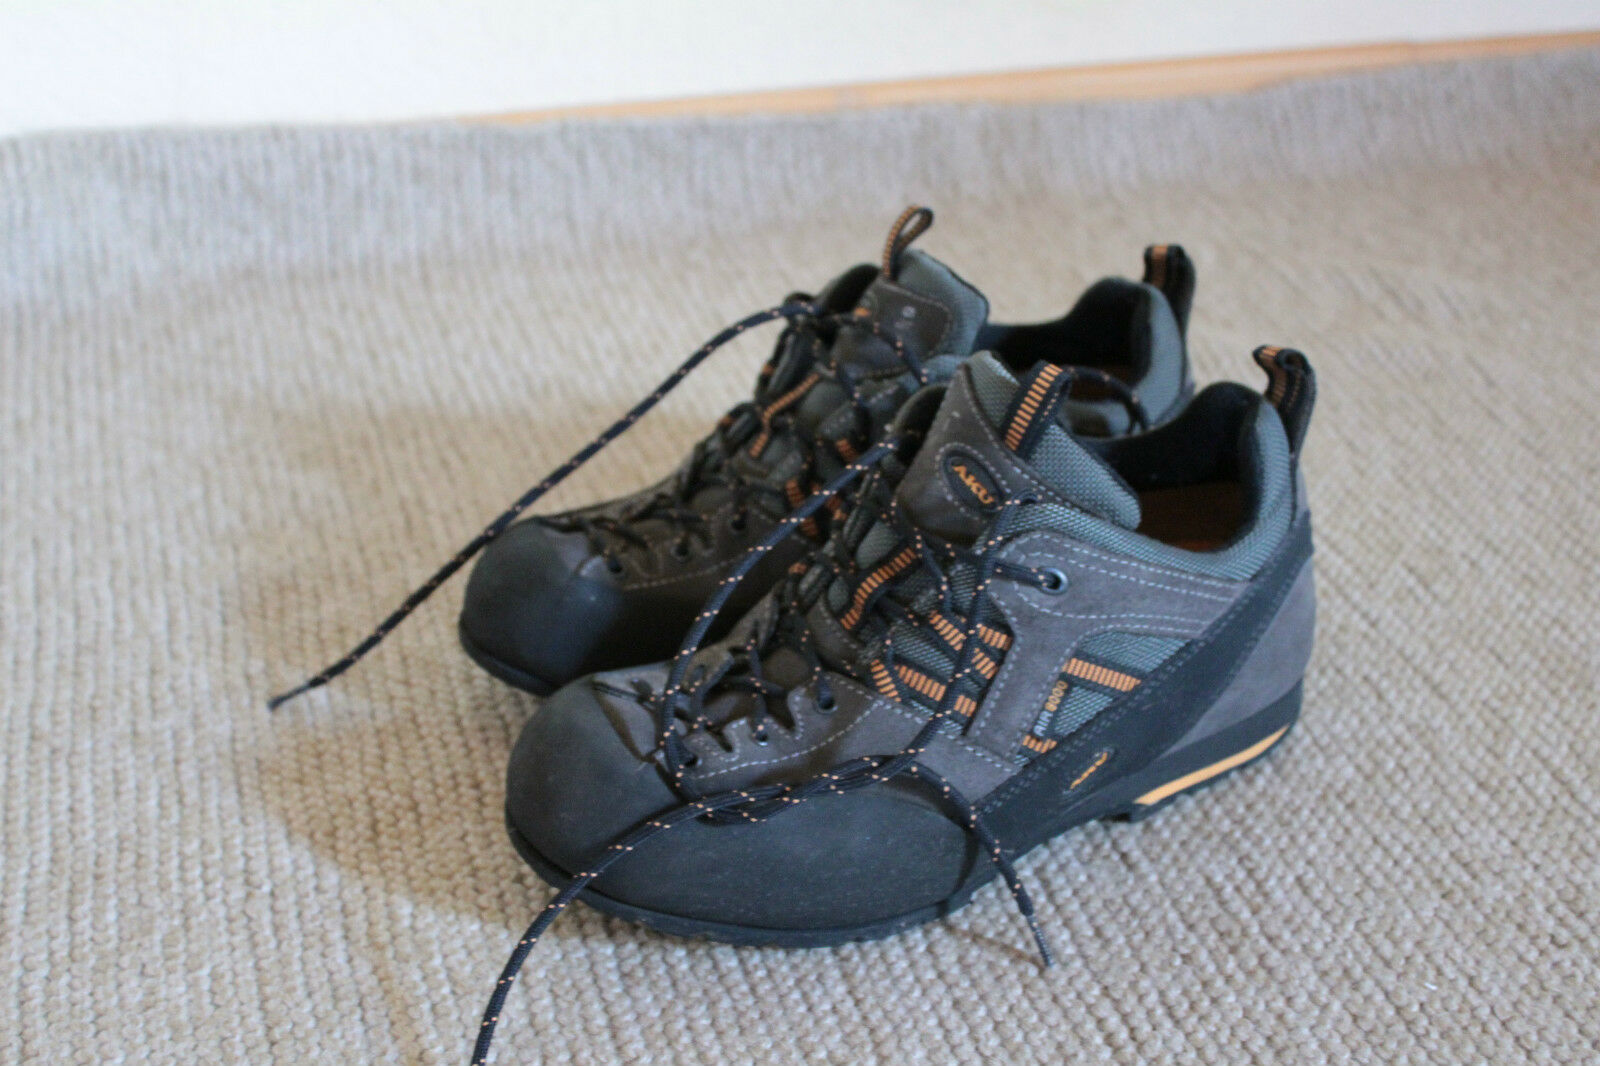 AKU Scarponcini Trekking Outdoor Scarpe Mis. 39 39, 5, ottime condizioni